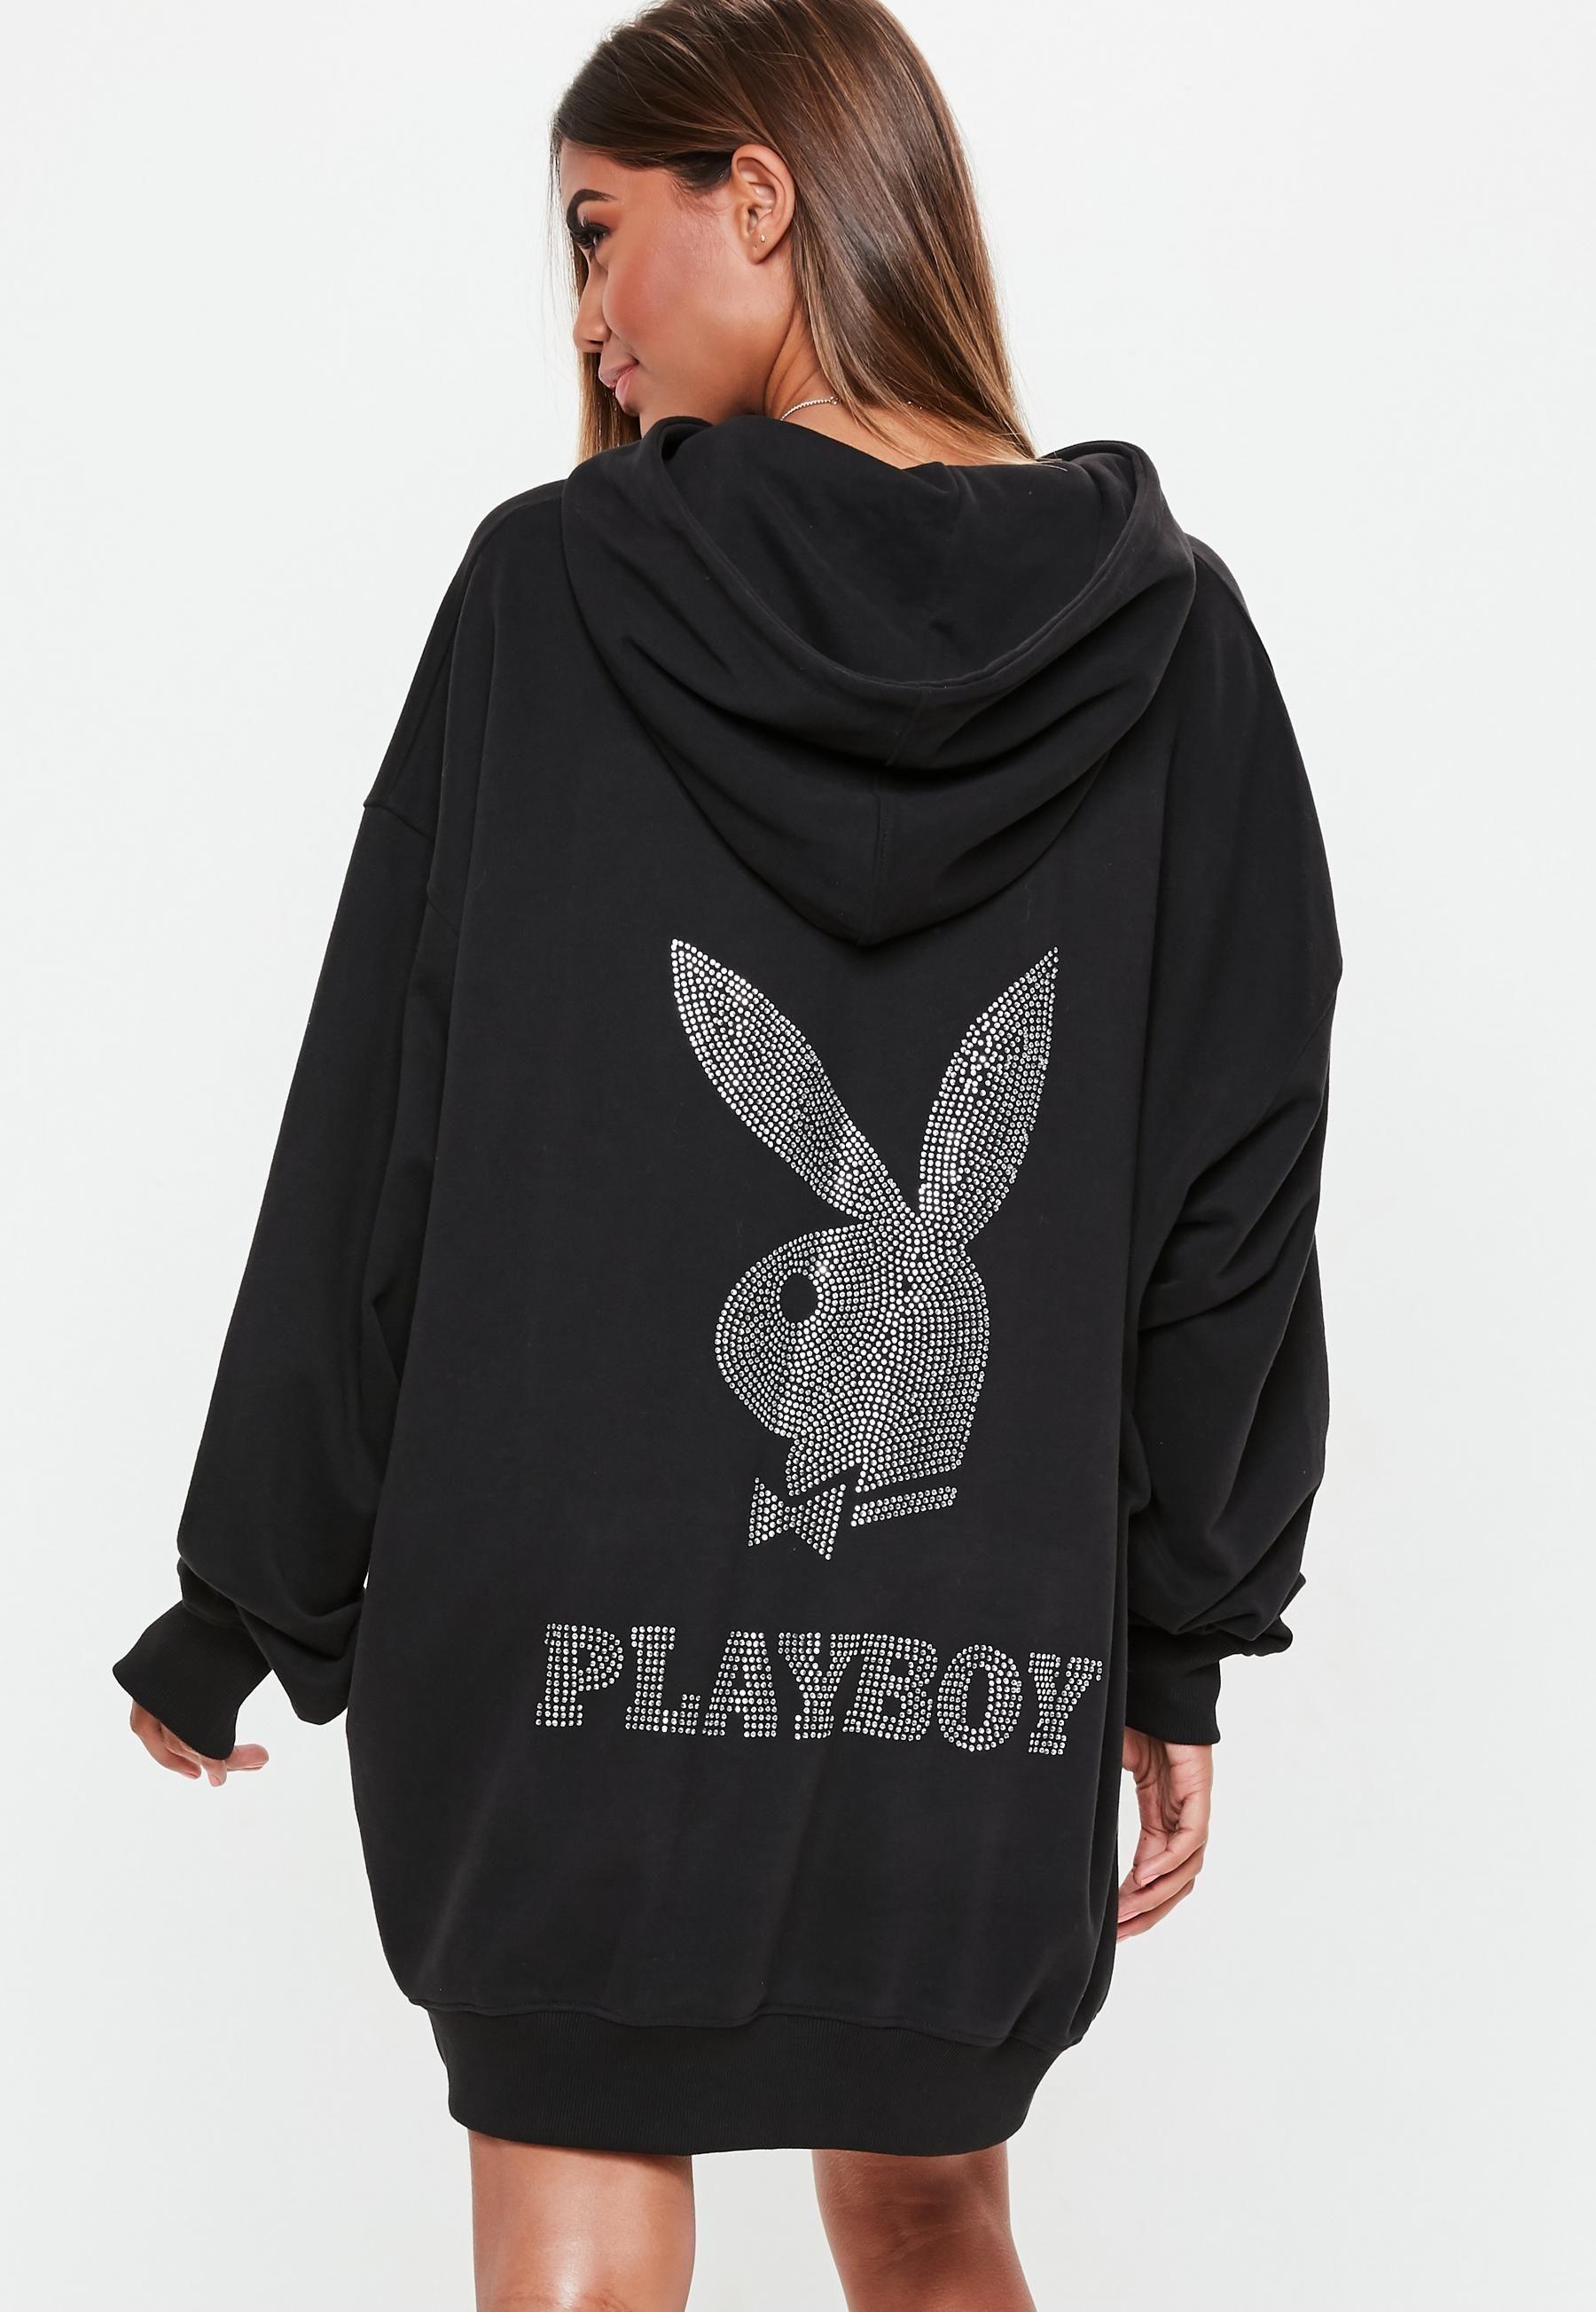 a51c0aeaab Playboy x Missguided Black Diamante Sweater Dress